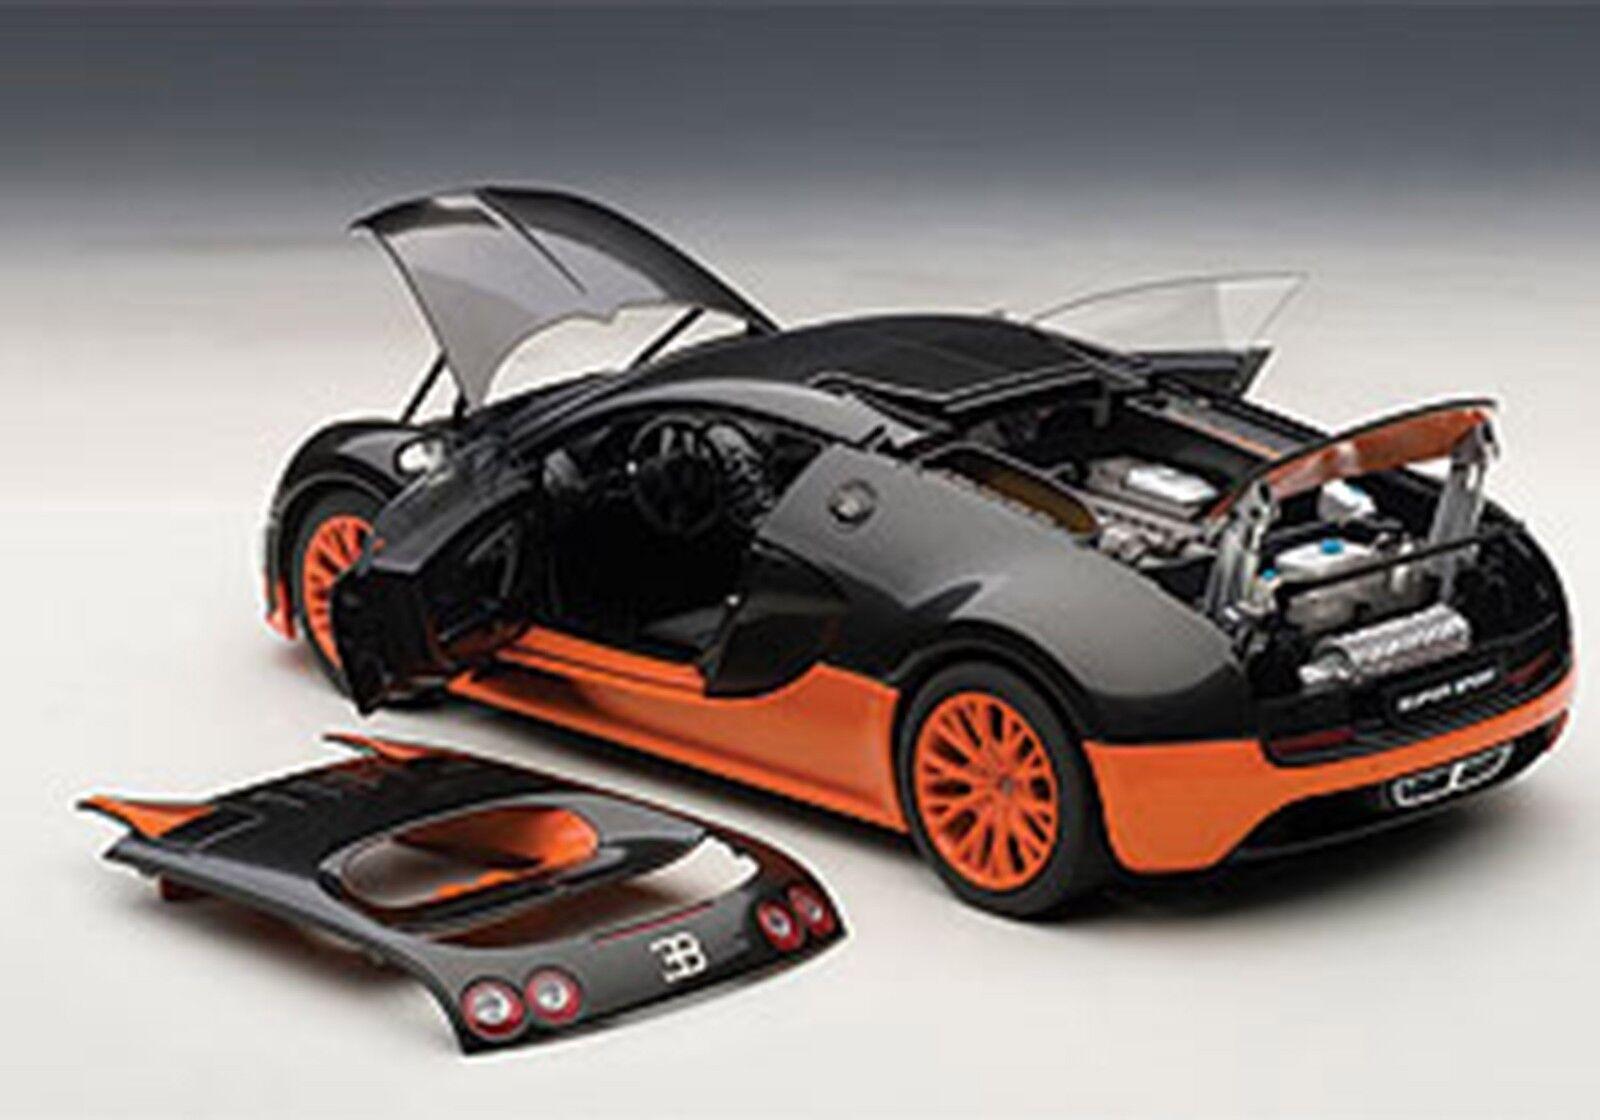 Autoart Bugatti Veyron Super Sport Carbón NegroNaranja Laterales  Raro